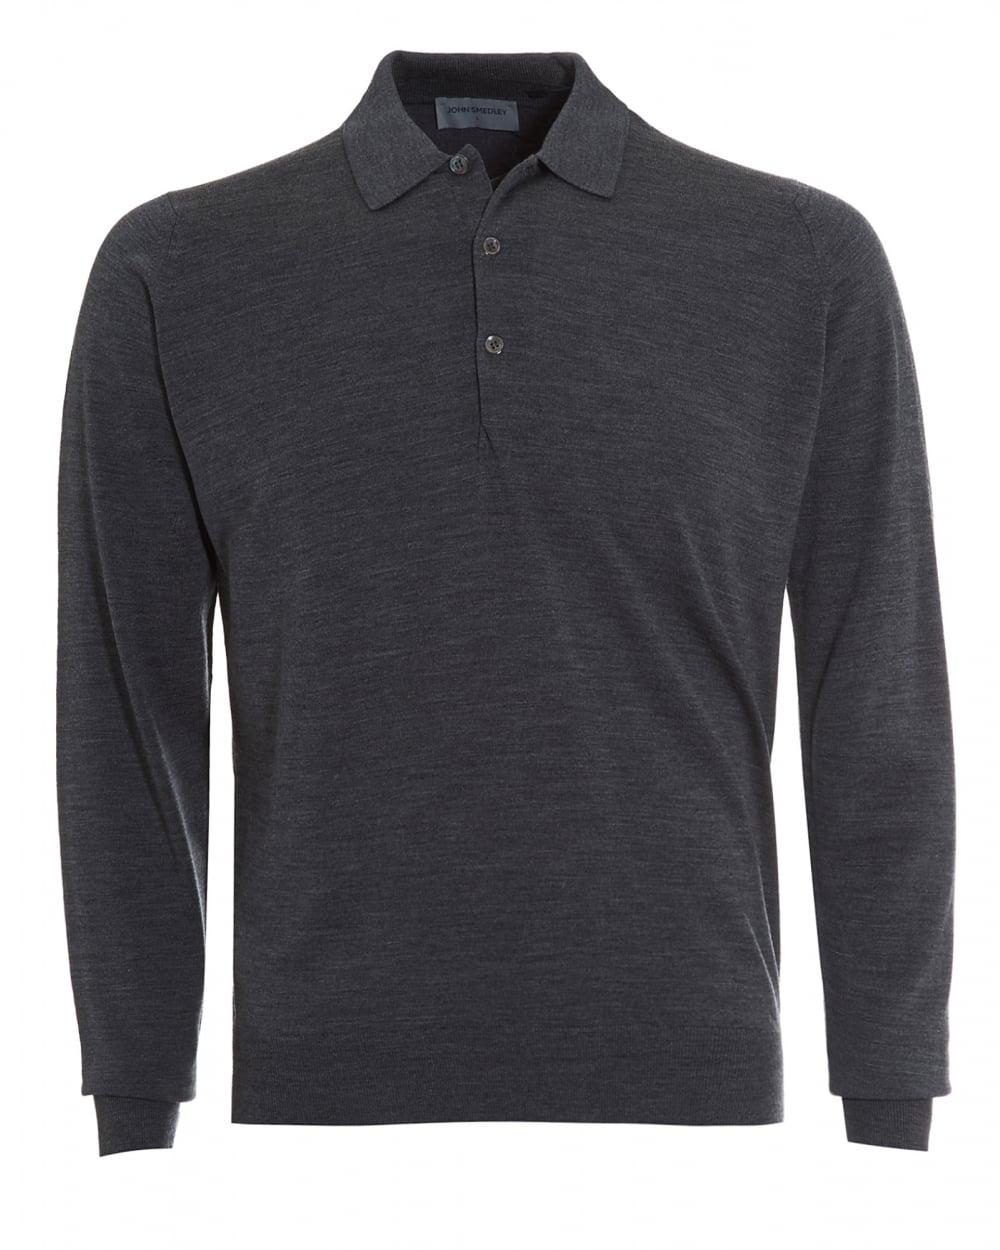 522923dc9 John Smedley Mens Polo, Tyburn Long Sleeved Charcoal Grey Polo Shirt